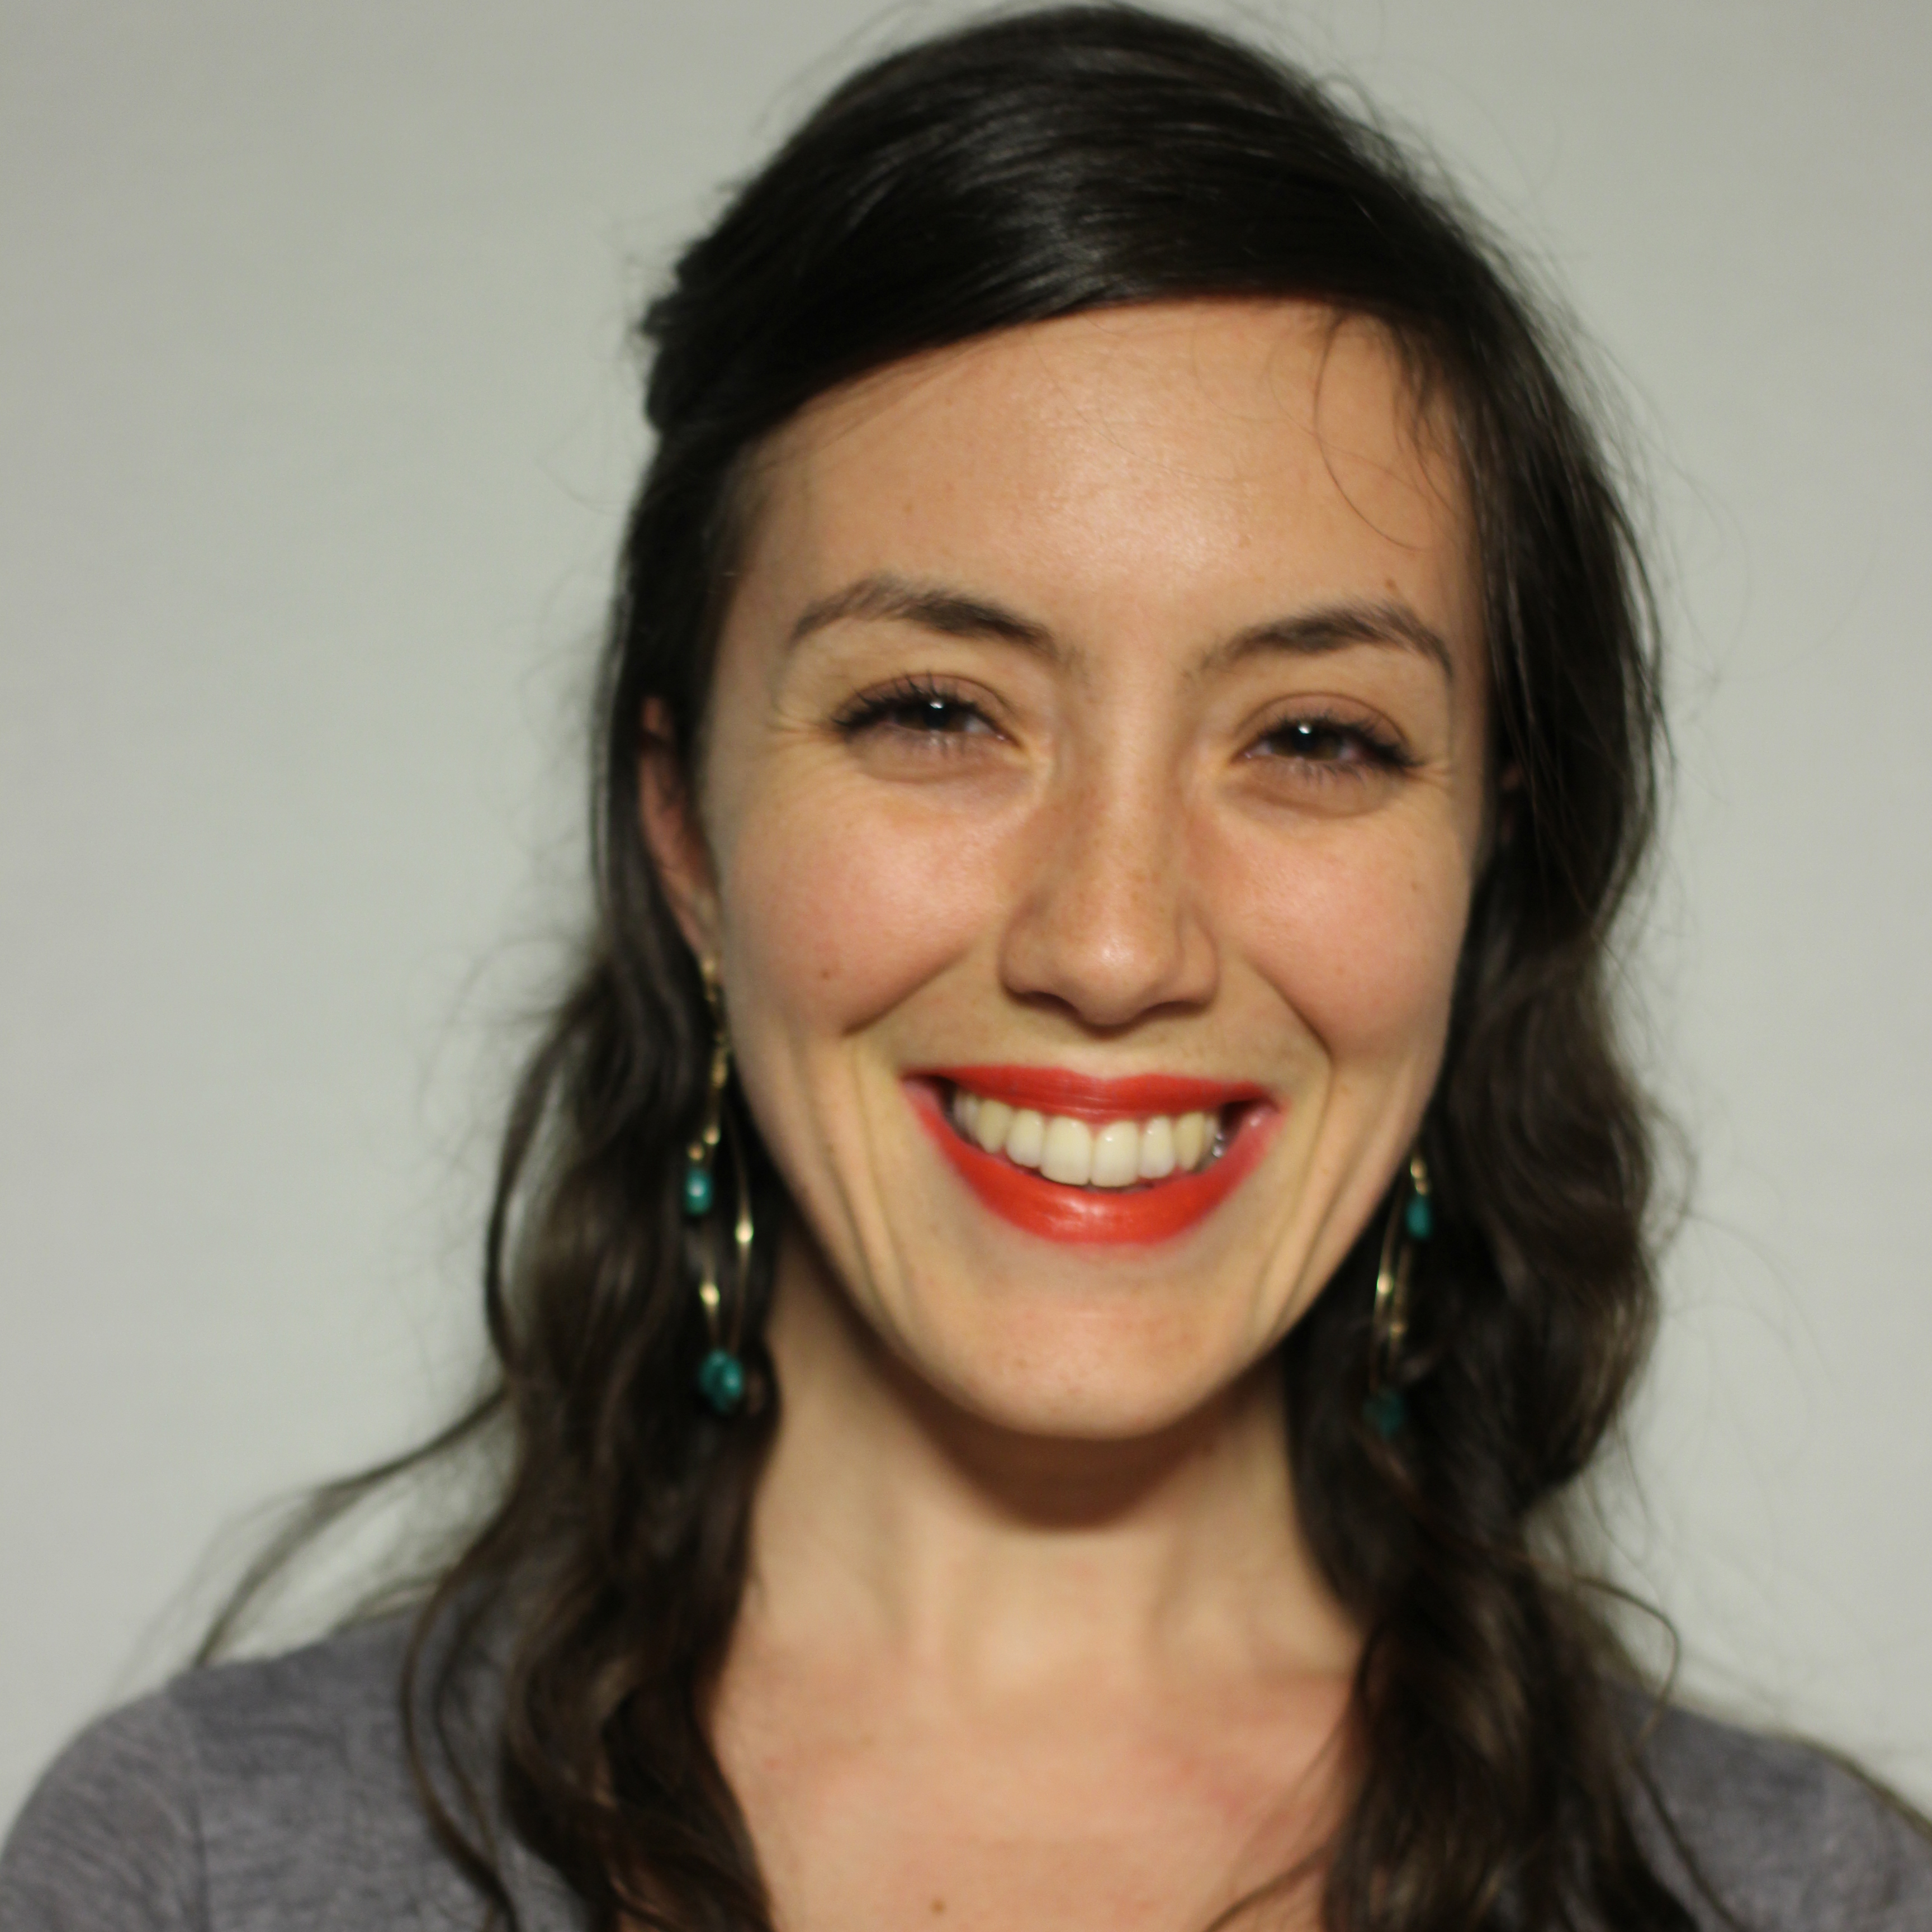 Chaela Herridge-Meyer